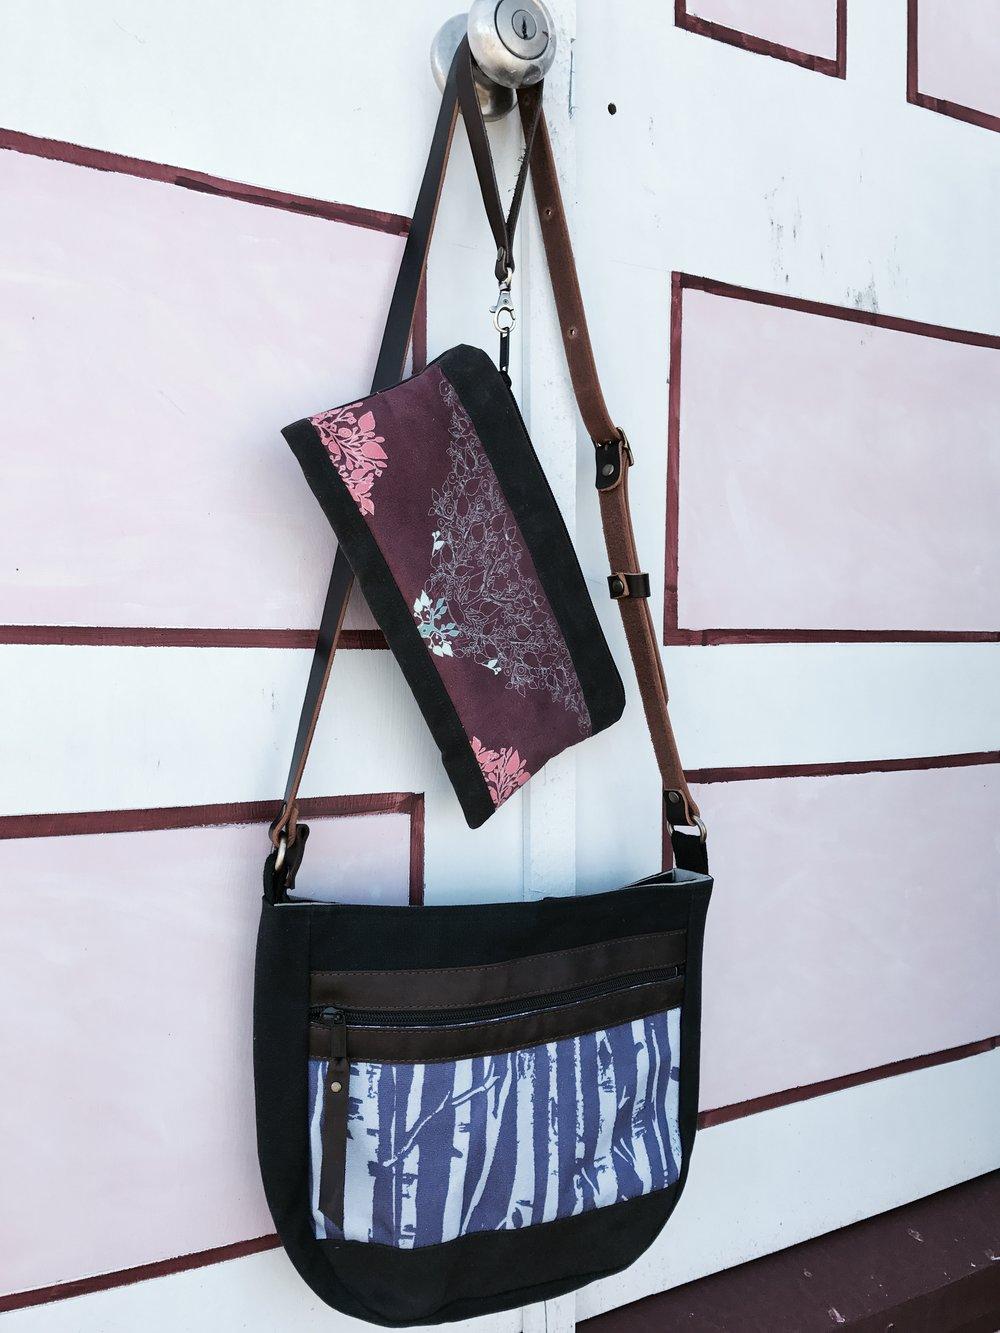 ragmaw handbag purse clutch pouch fabric leather handmade st.john's newfoundland